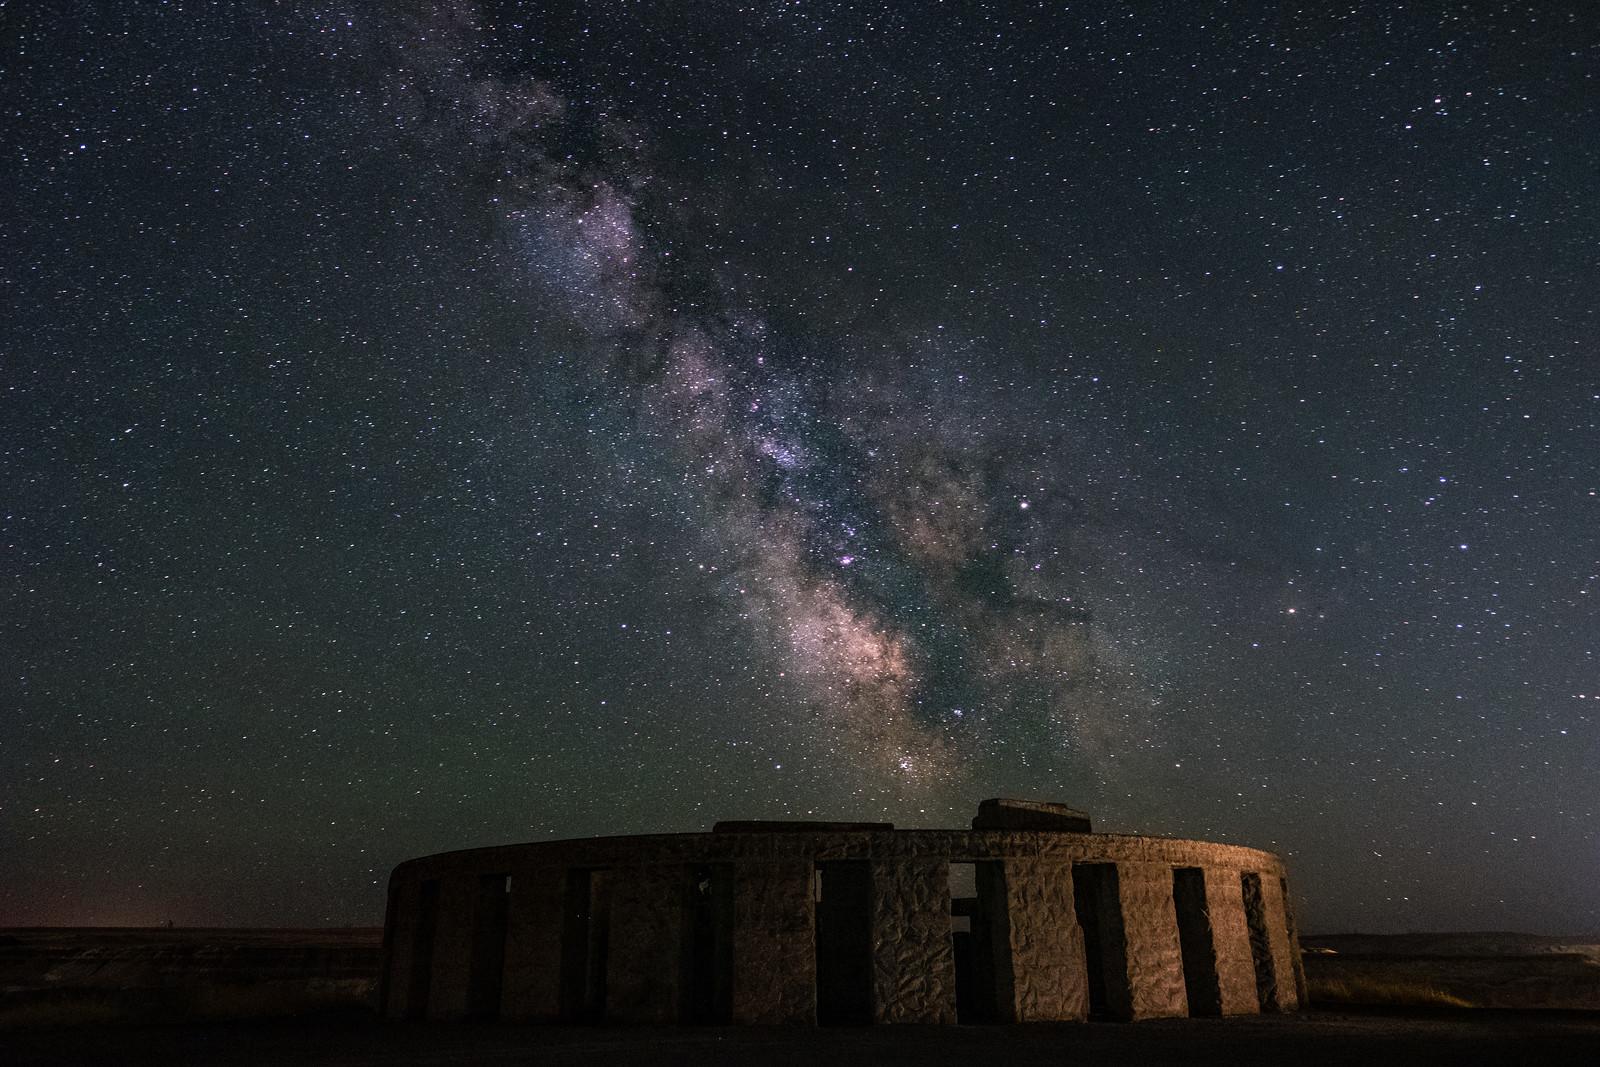 Maryhill Stonehenge at night